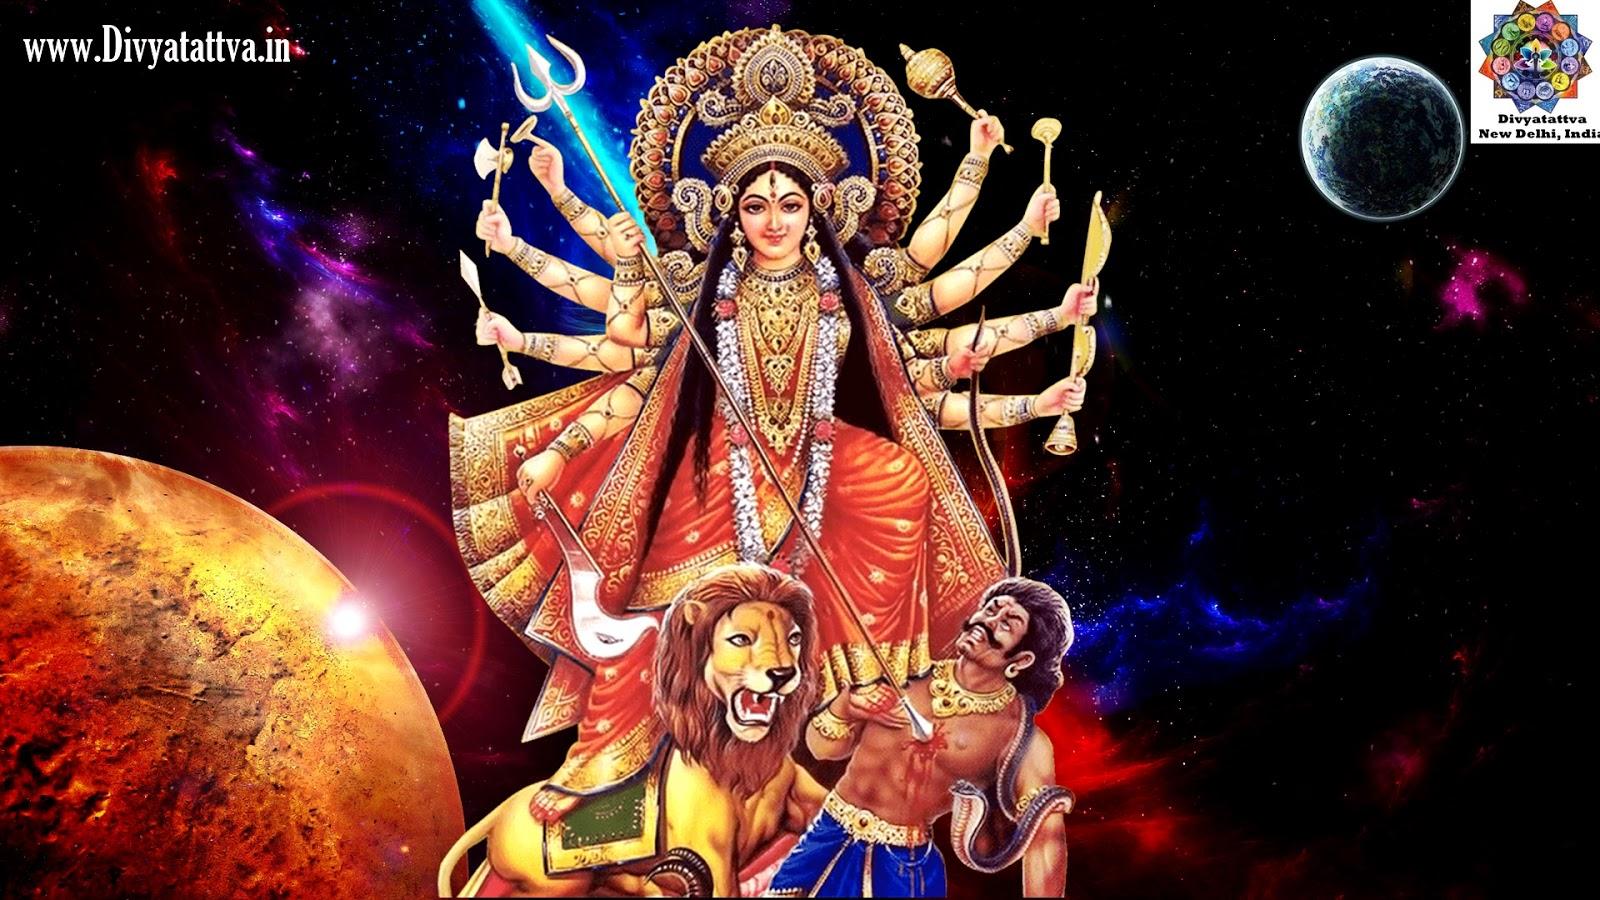 Divyatattva Astrology Free Horoscopes Psychic Tarot Yoga Tantra Occult Images Videos Durga Maa Hd 4k Wallpapers Free Download Navrartri Backgrounds By Divyatattva